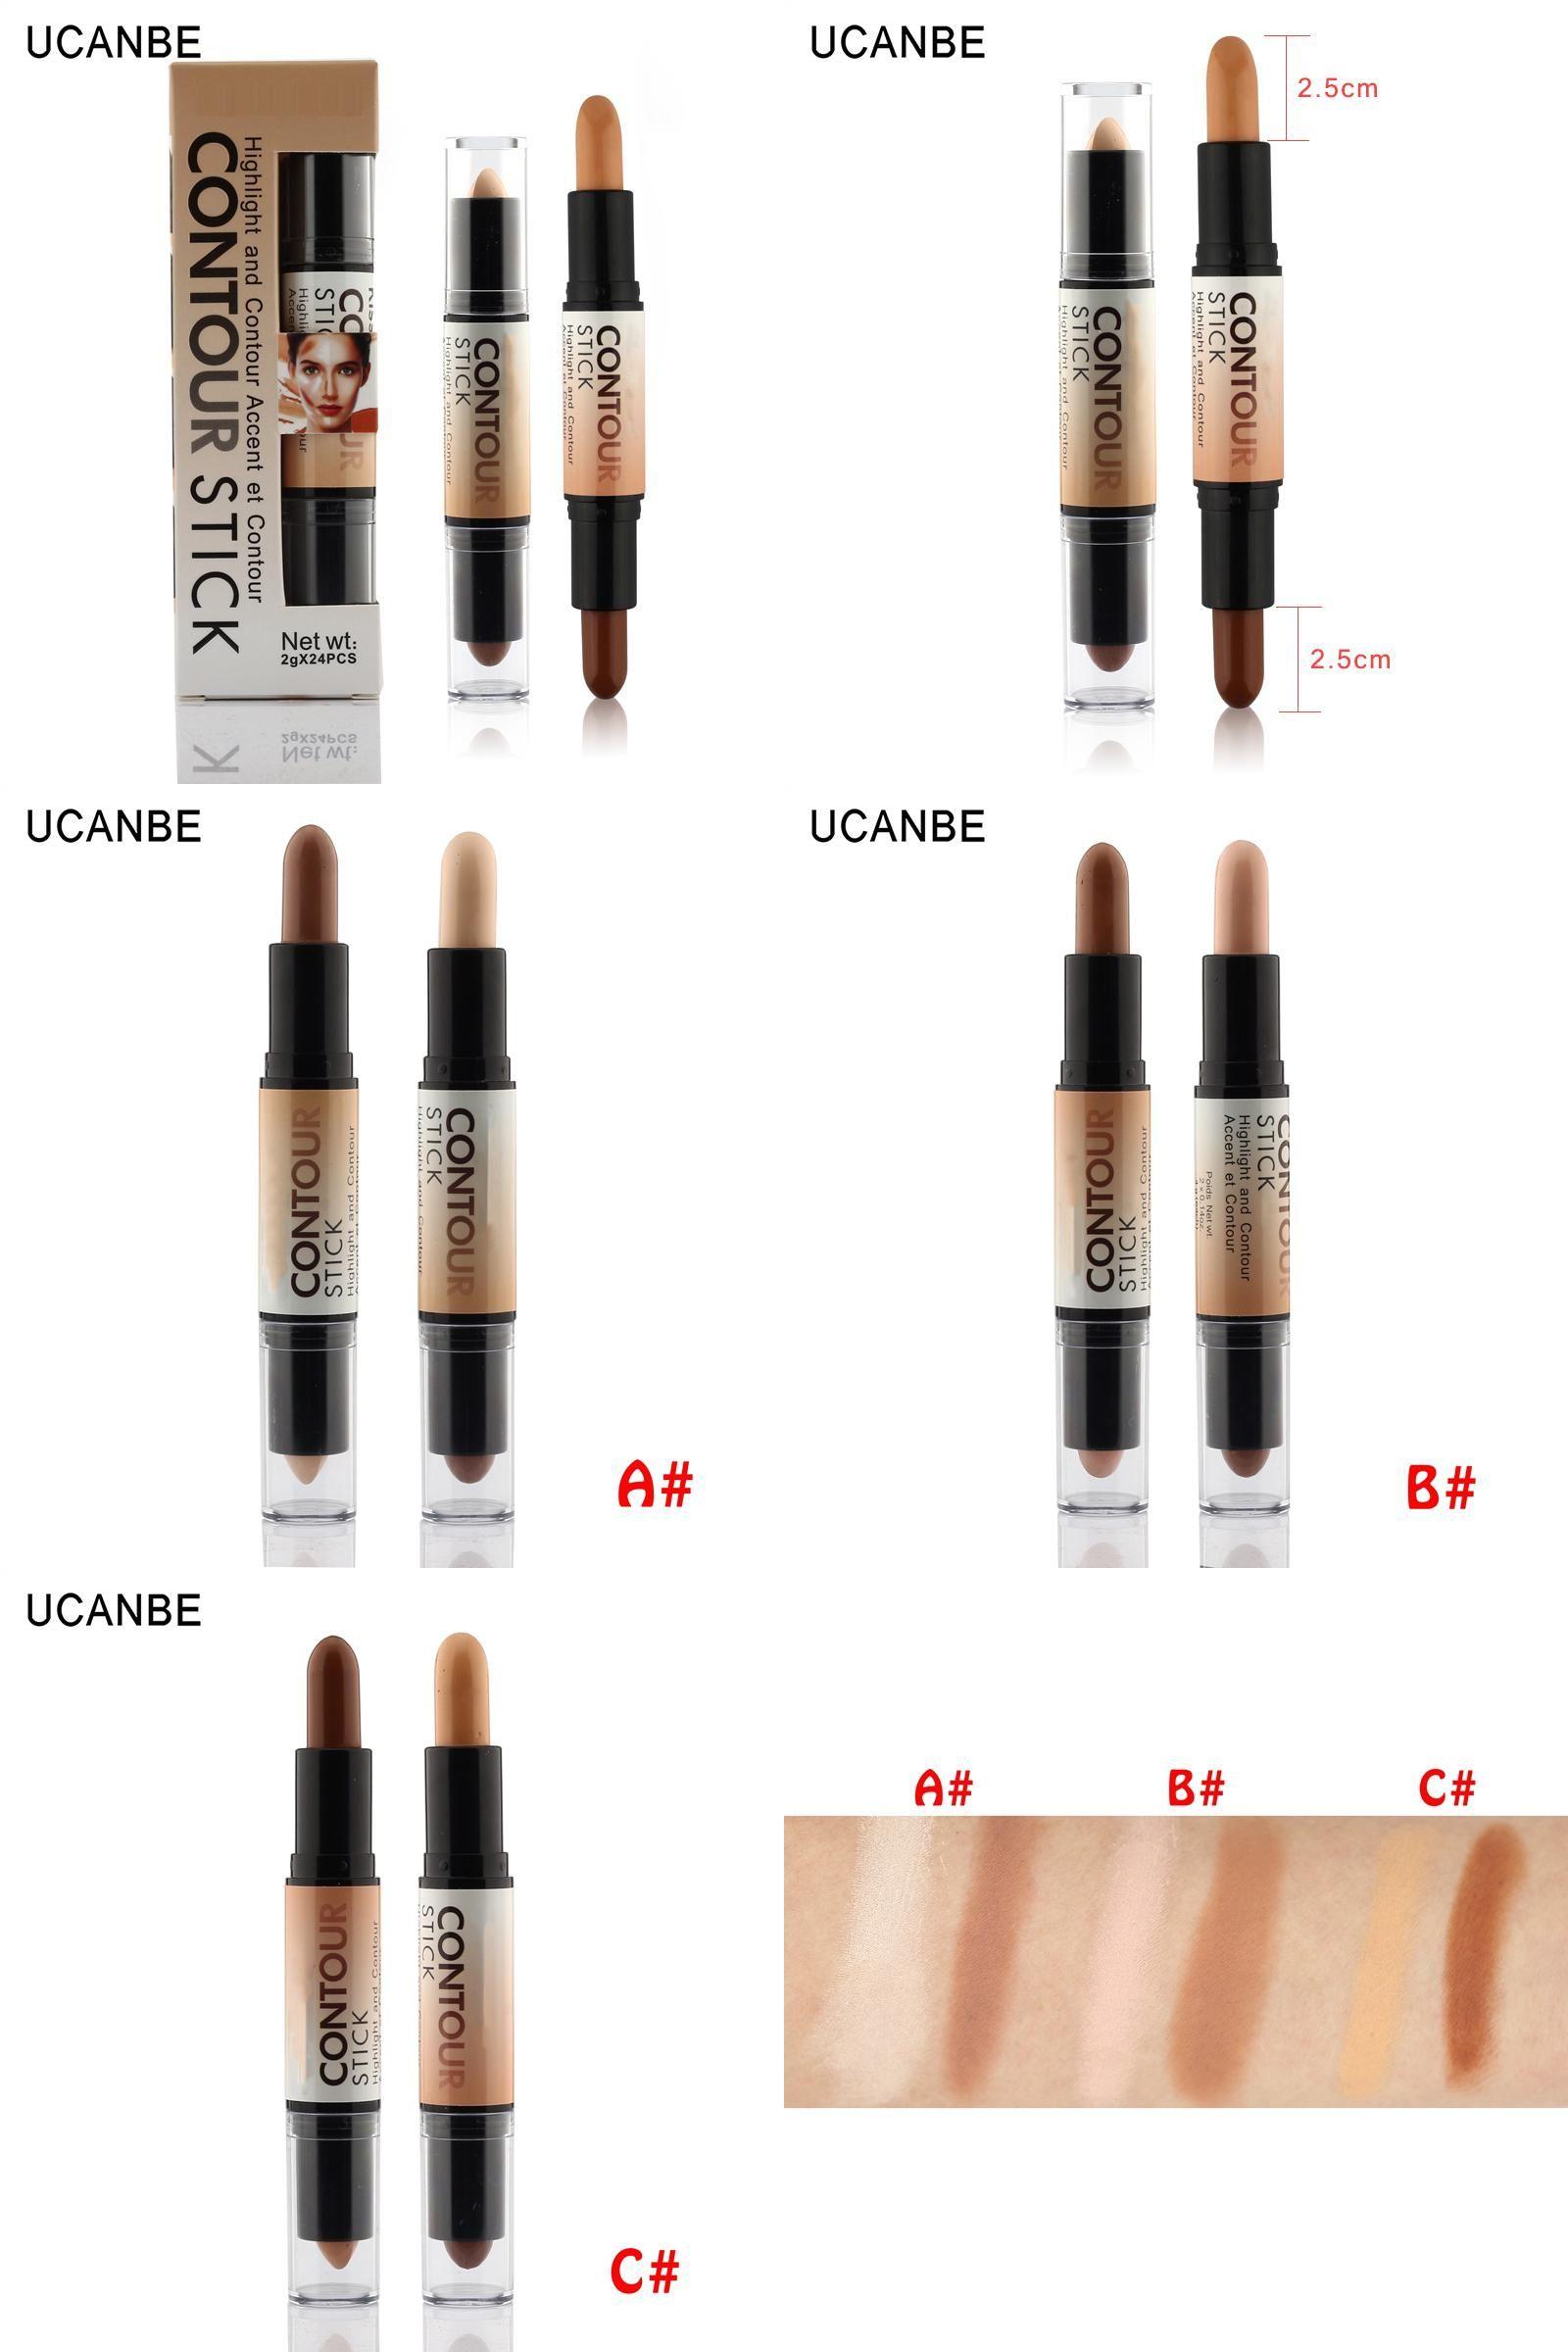 [Visit to Buy] Makeup Creamy Doubleended 2 in1 Contour